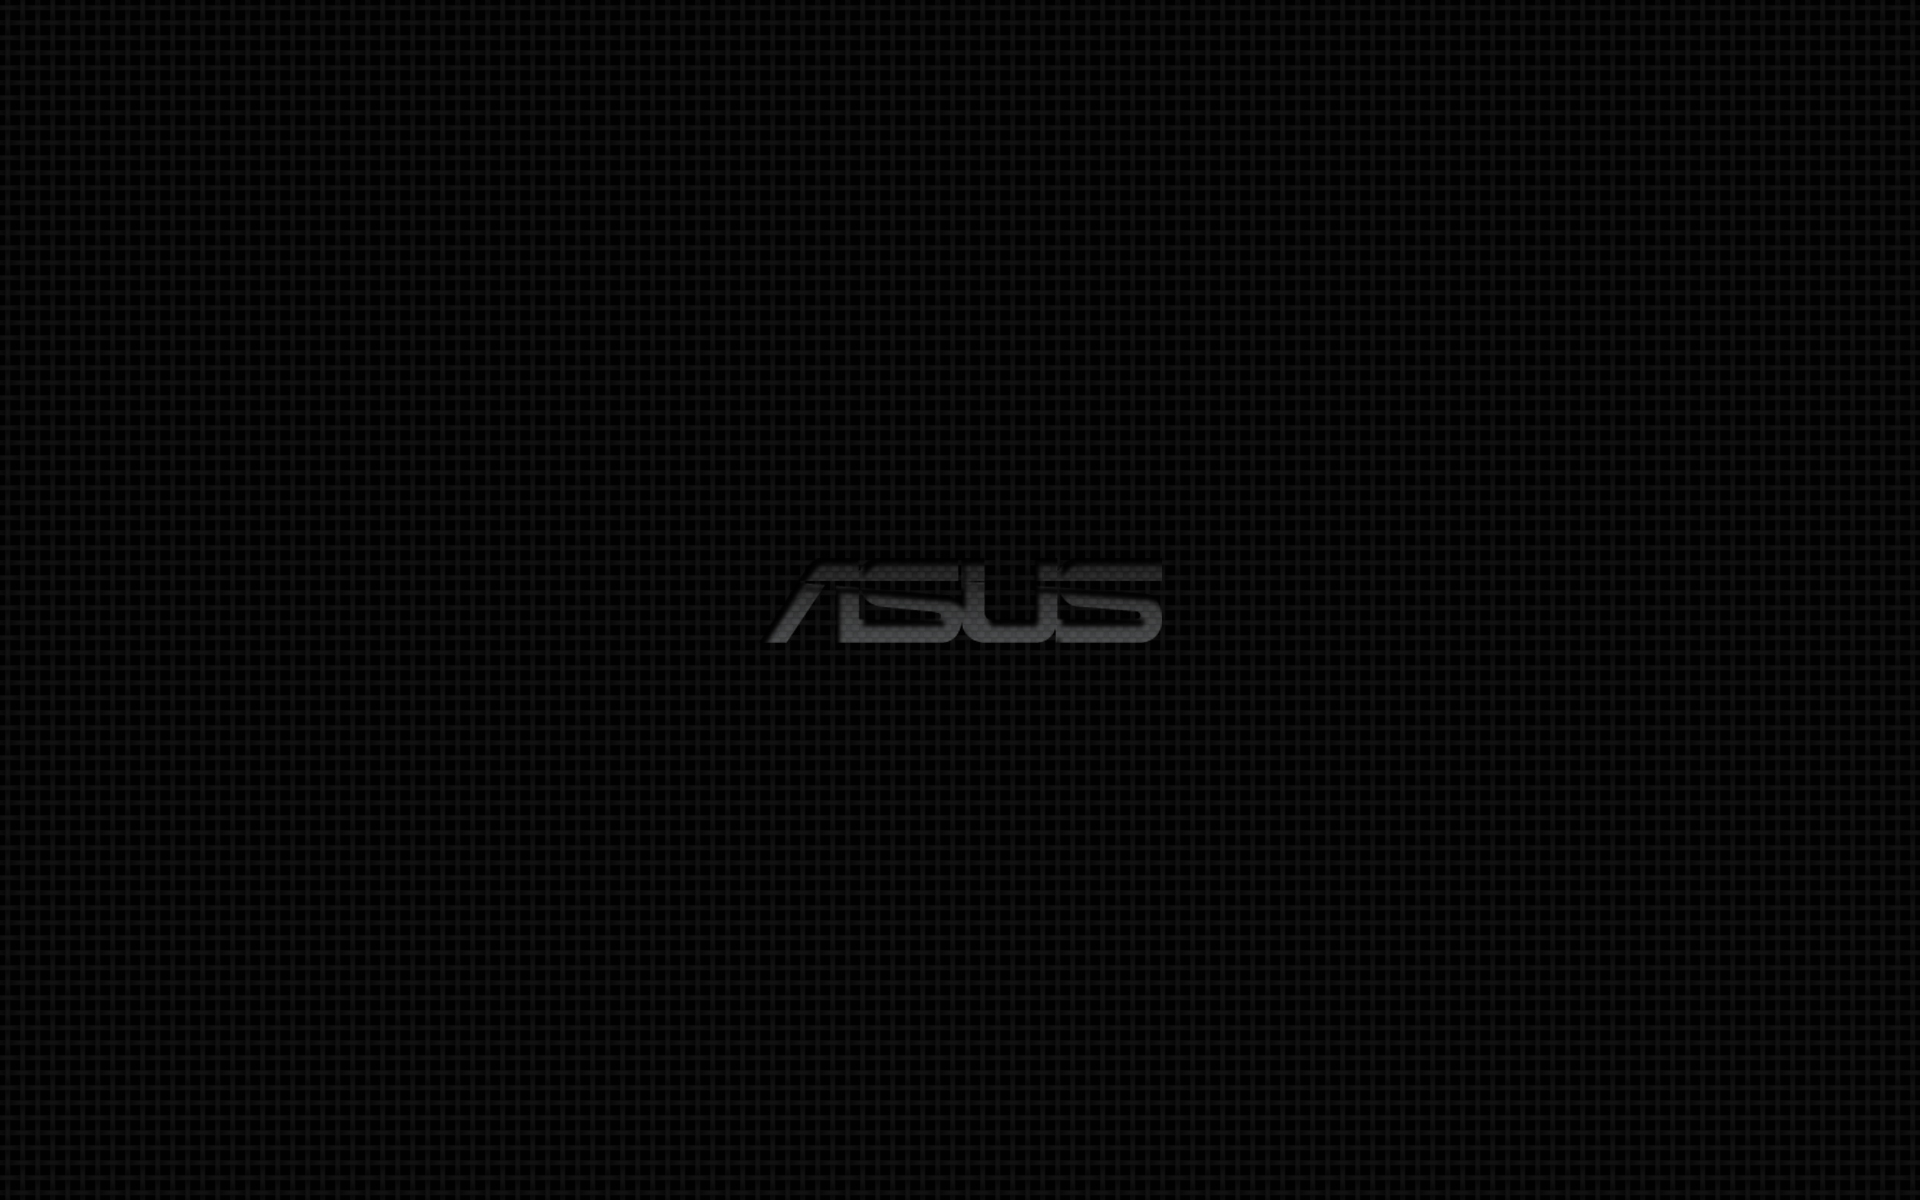 Asus Wallpaper 1920X1080 238049 1920x1200